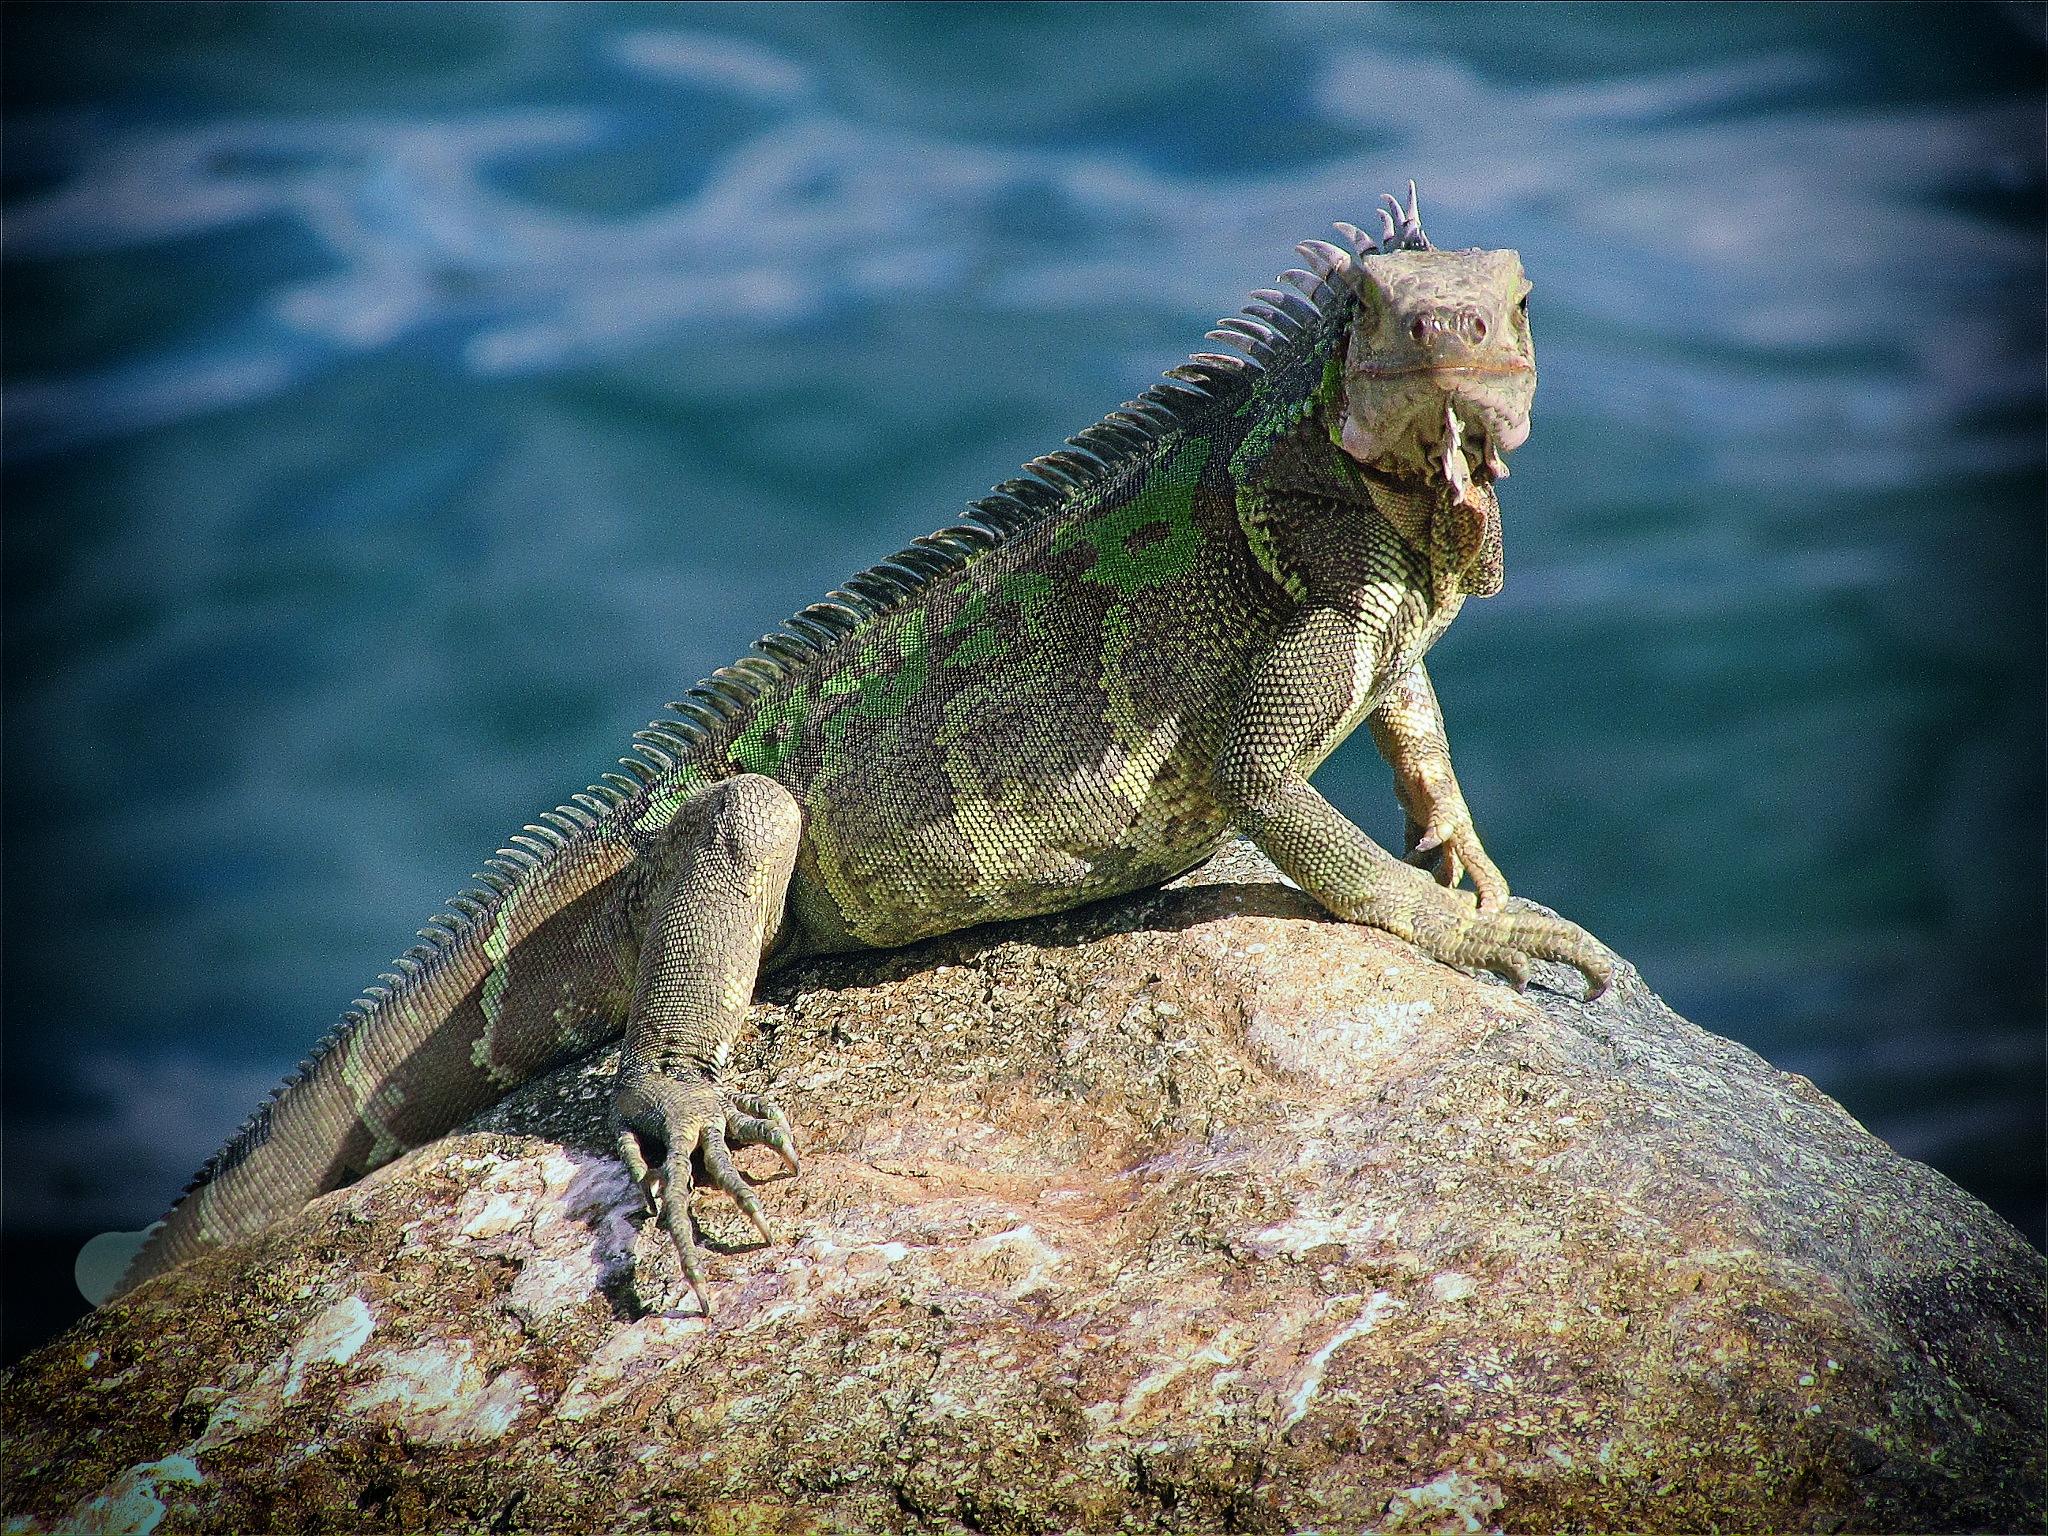 Iguana by Ada Tsodikov Photography